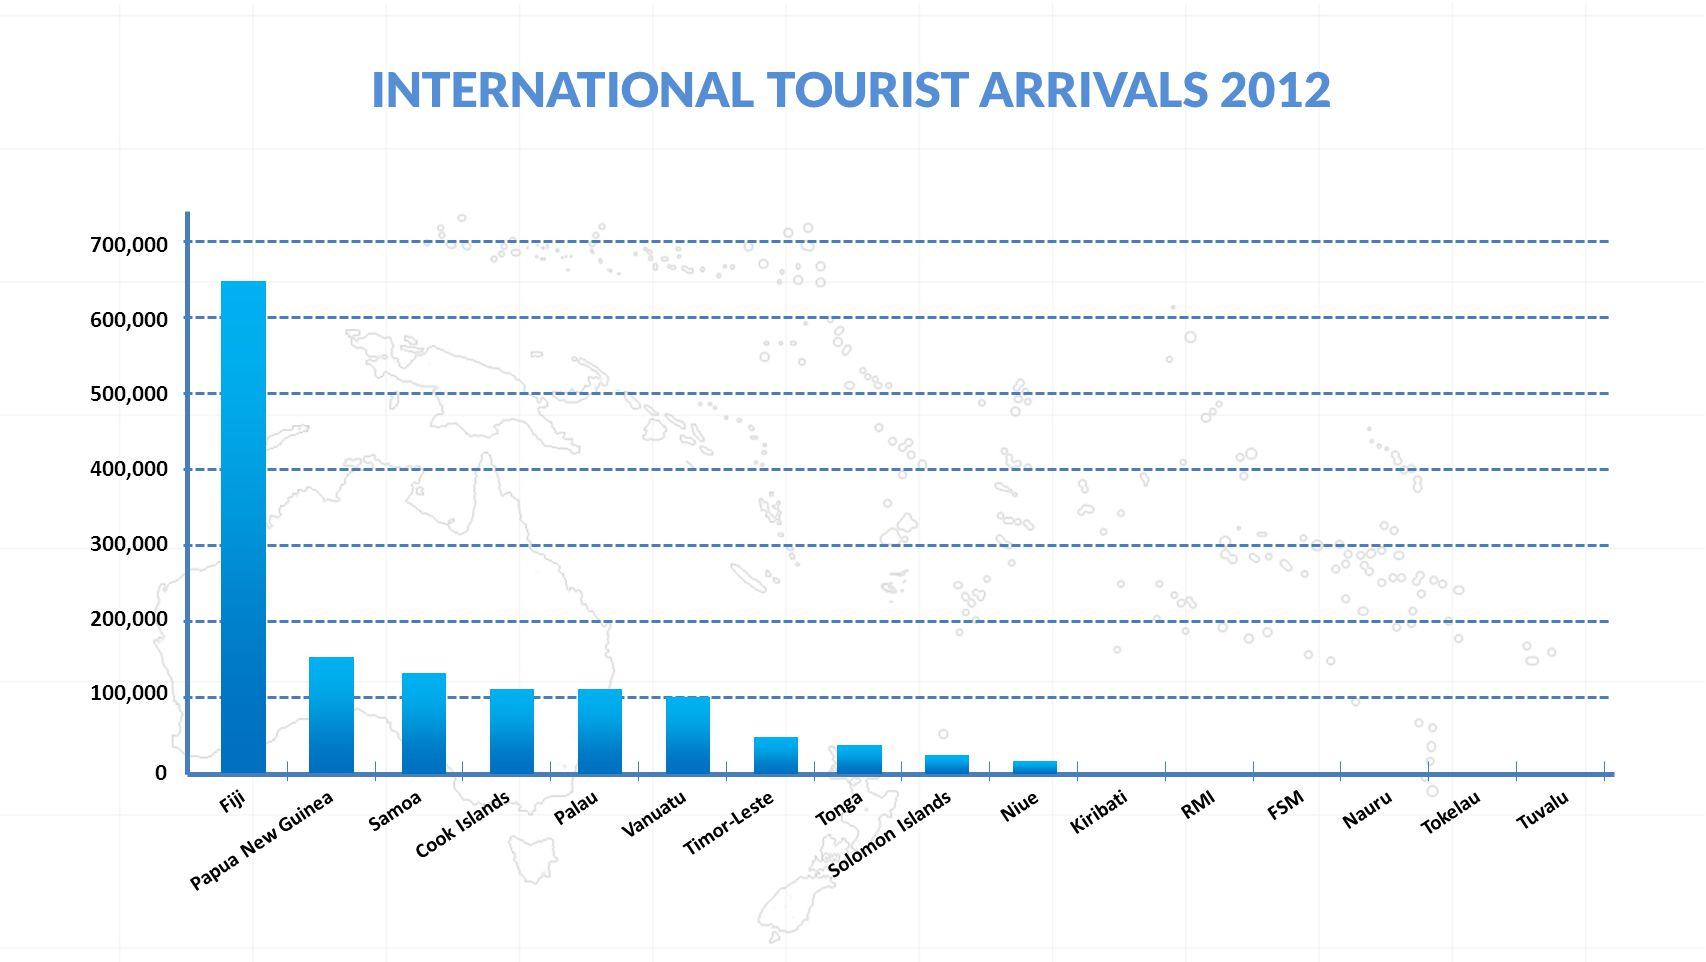 INTERNATIONAL TOURIST ARRIVALS 2012 FijiPapua New GuineaSamoaCook IslandsPalauVanuatuTimor-LesteTongaSolomon IslandsNiueKiribatiRMIFSMNauruTokelauTuvalu 0 500,000 400,000 300,000 200,000 100,000 600,000 700,000